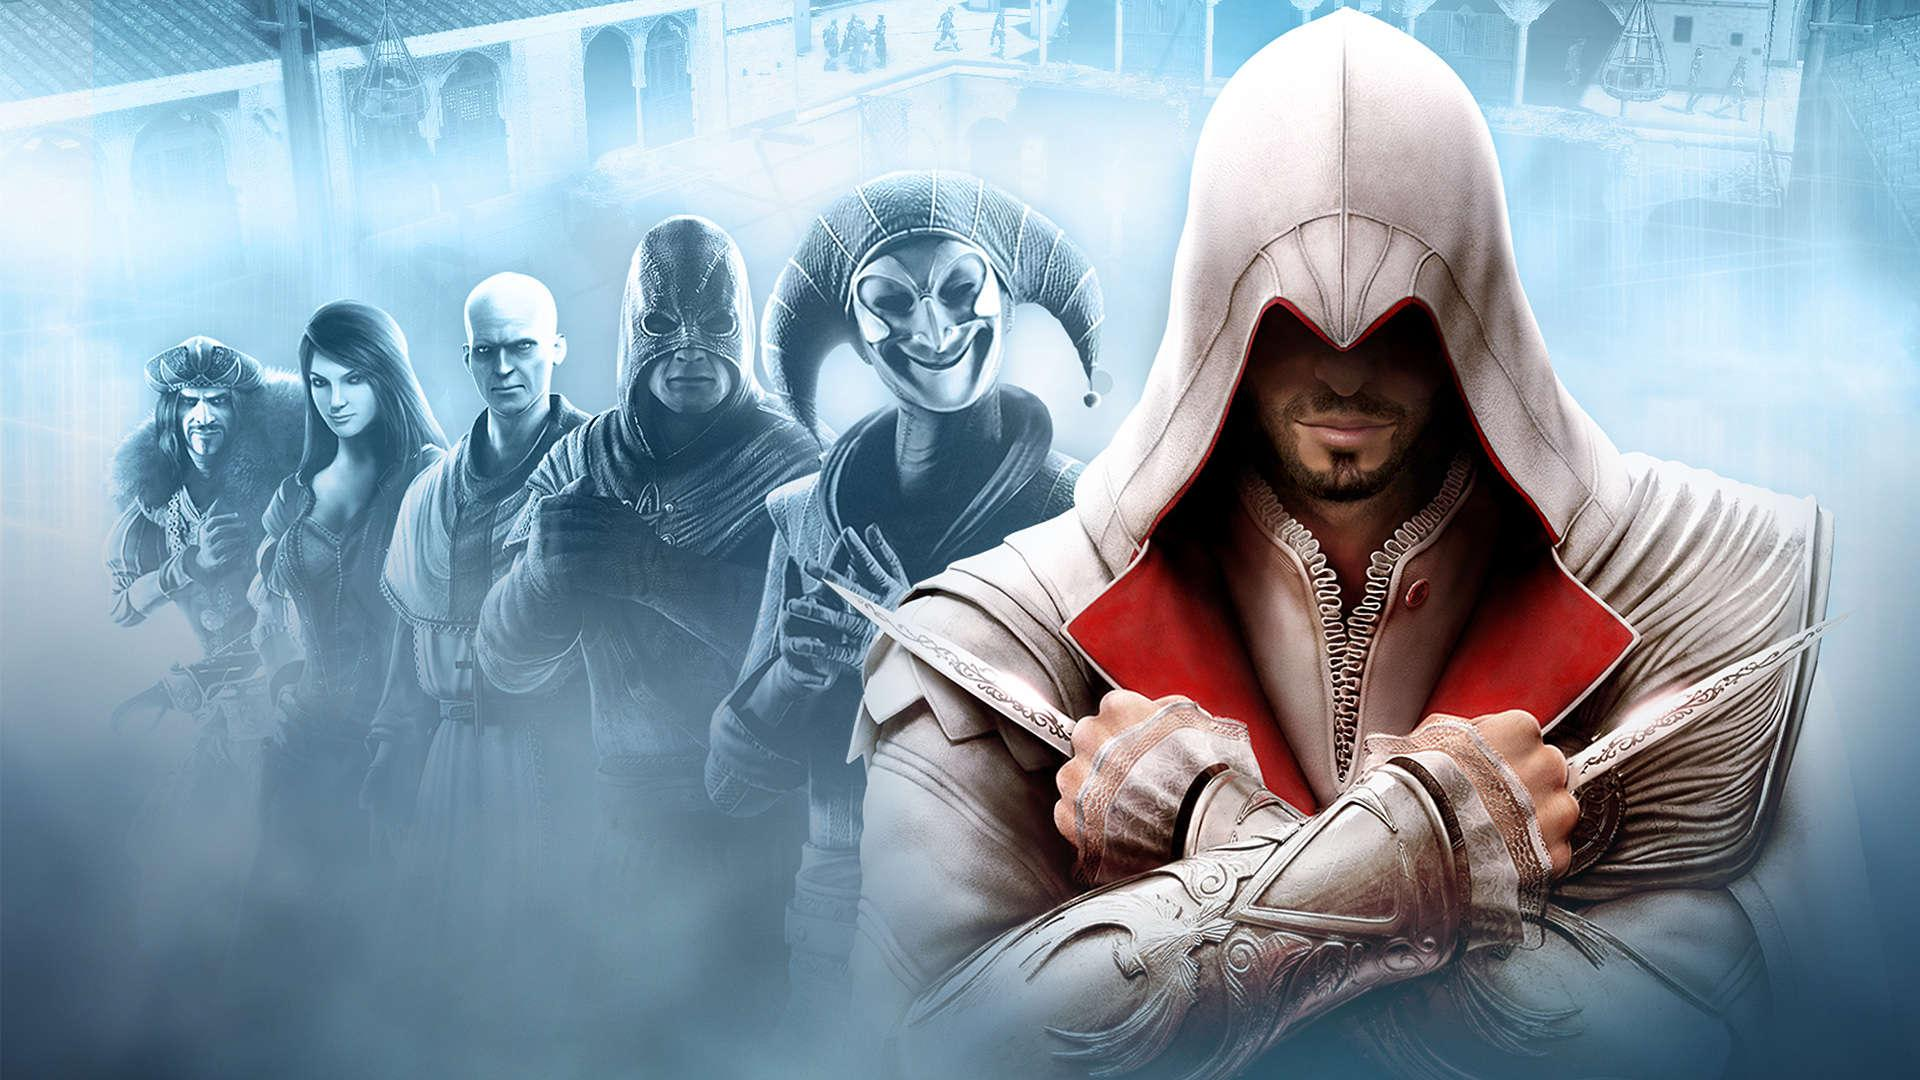 Assassins Creed Brotherhood Wallpaper: Assassin's Creed HD Wallpapers